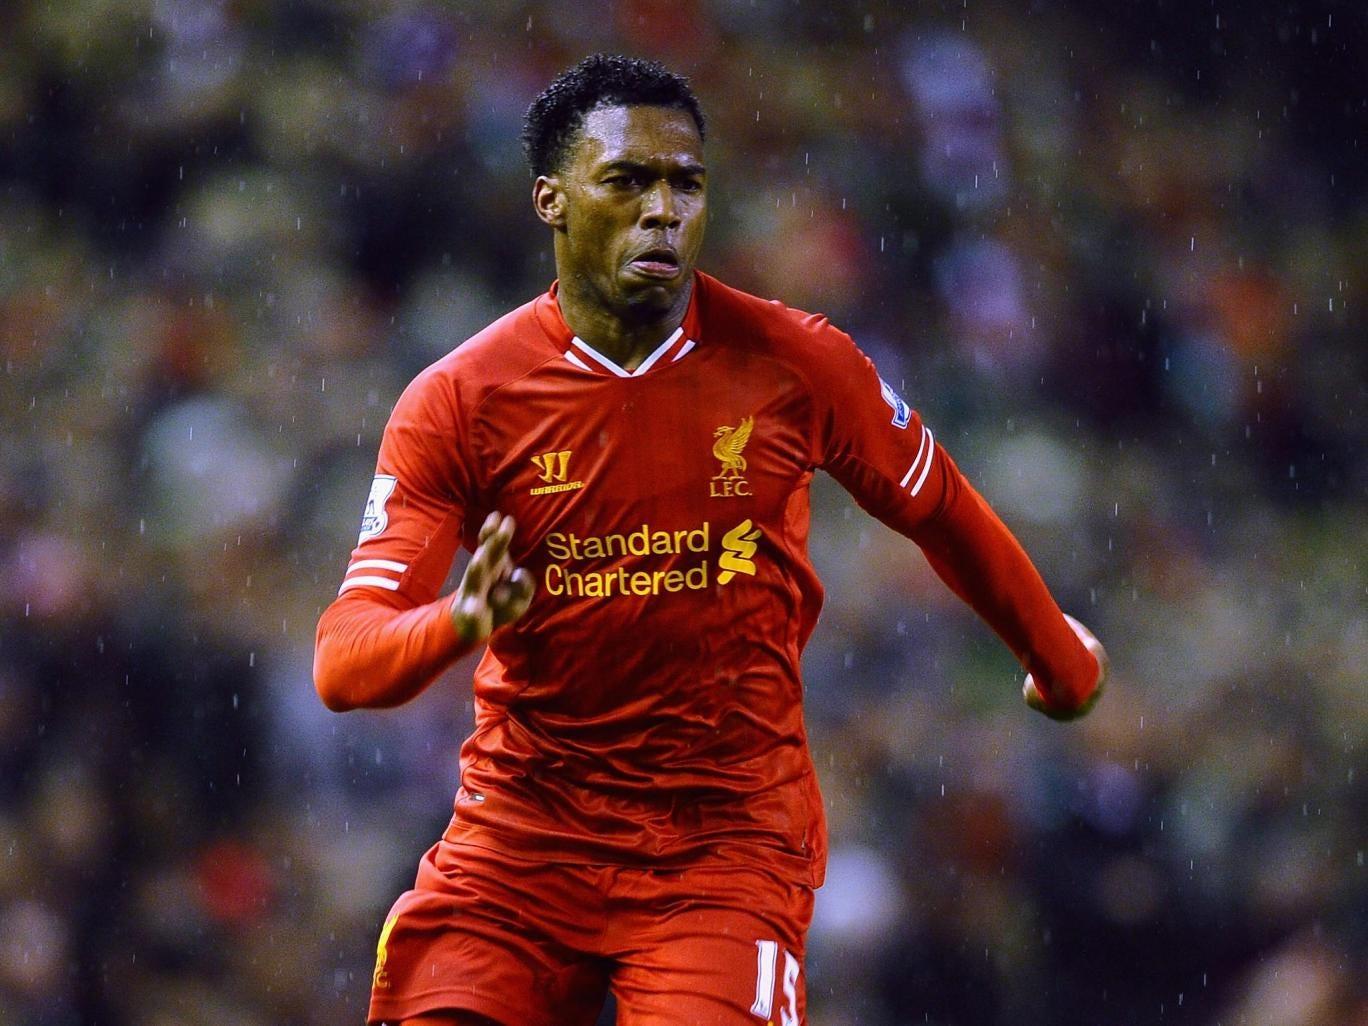 Daniel Sturridge of Liverpool in action back in January